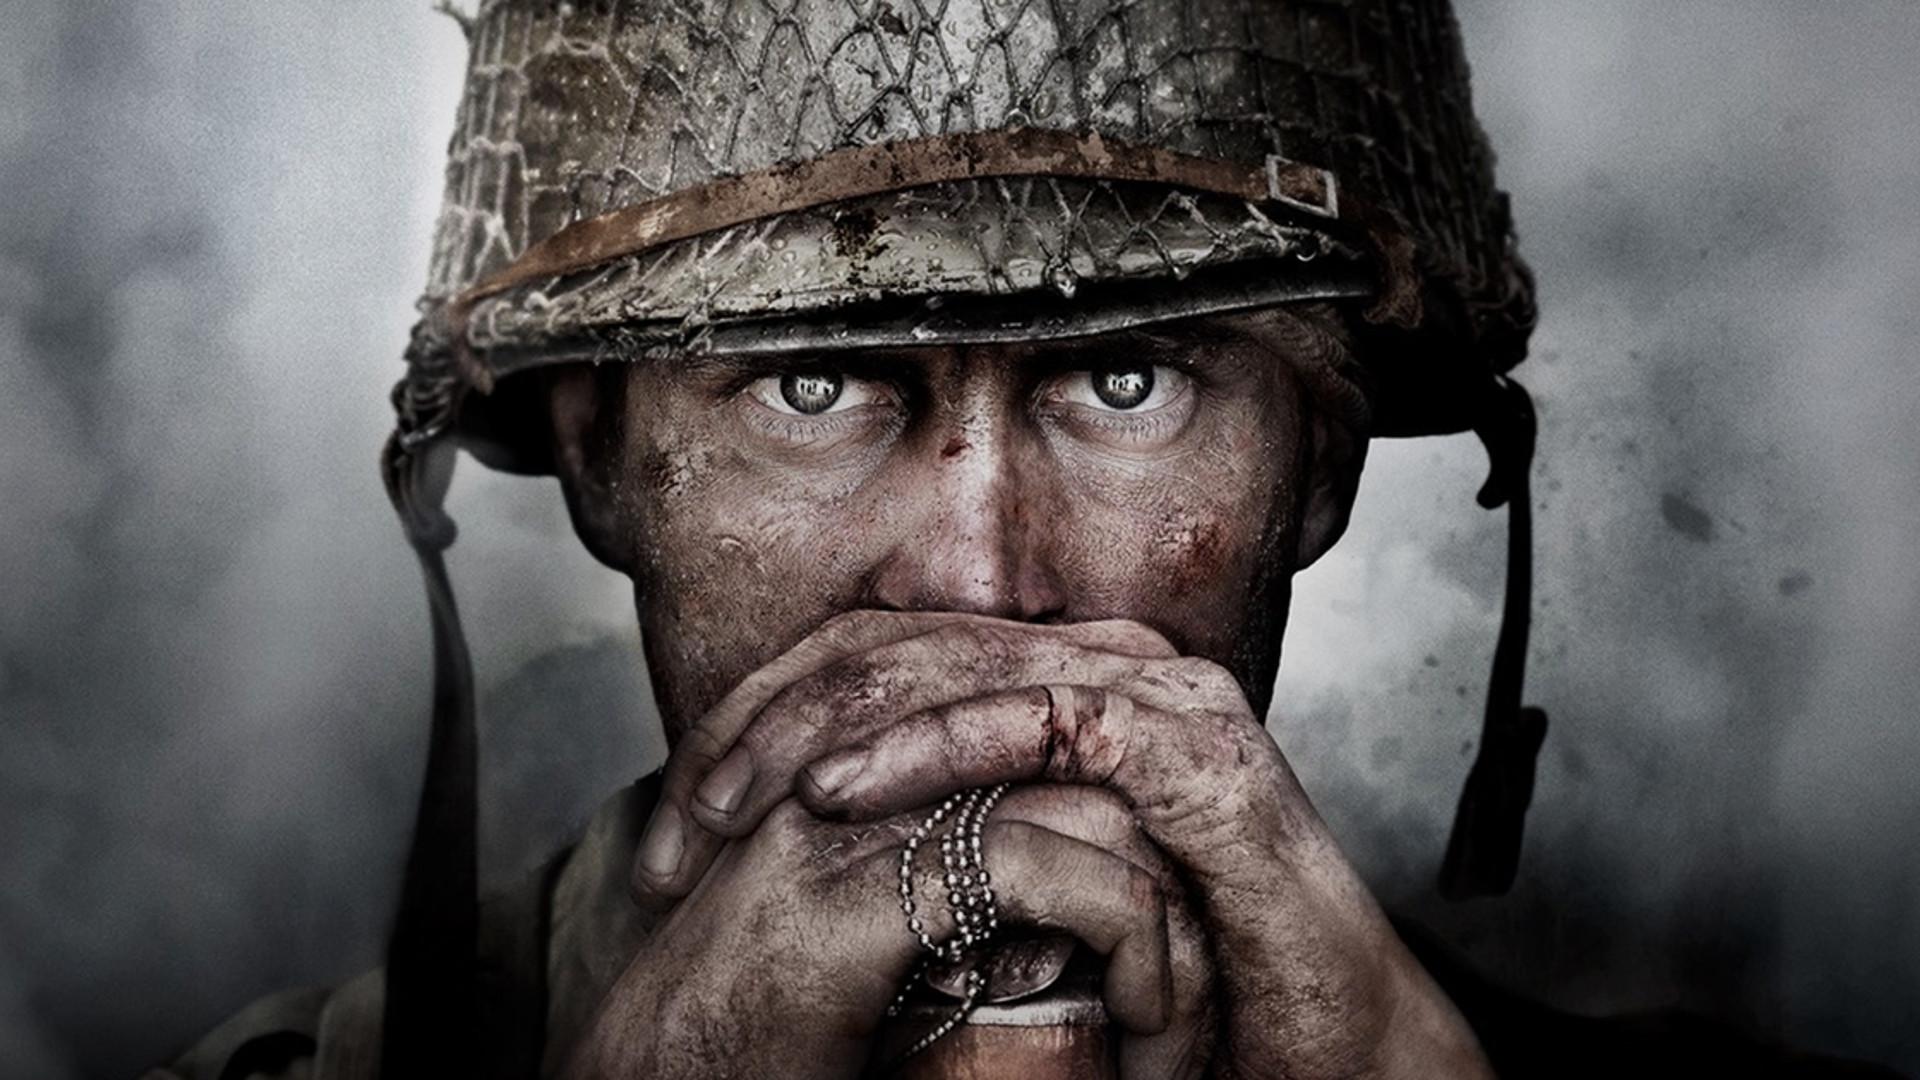 Call of Duty 2 World War II Weapon Soundpack addon   Mod DB 1920x1080